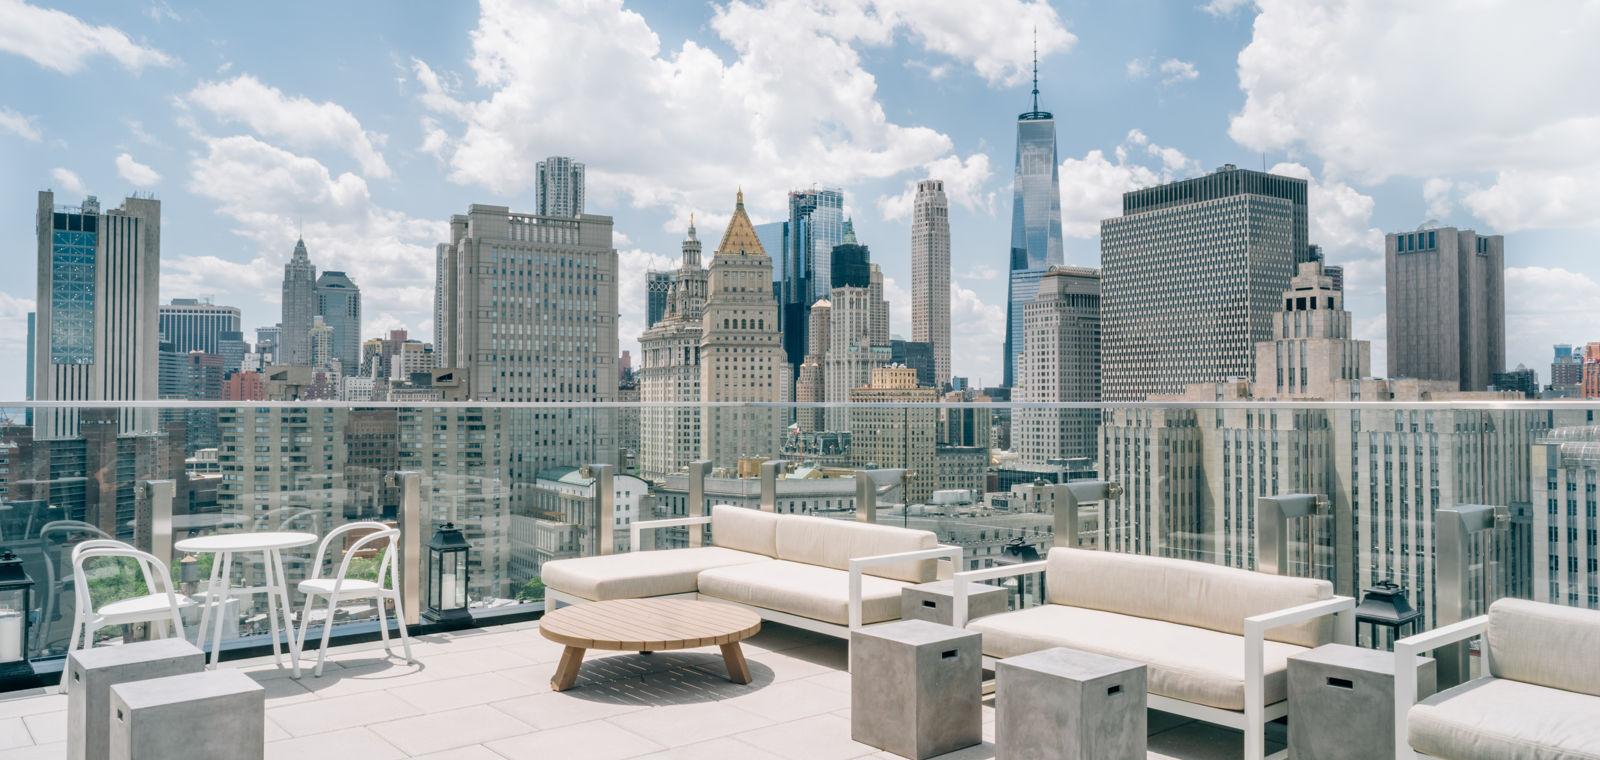 [Crown] [Rooftop] [Lounge] [Bar]